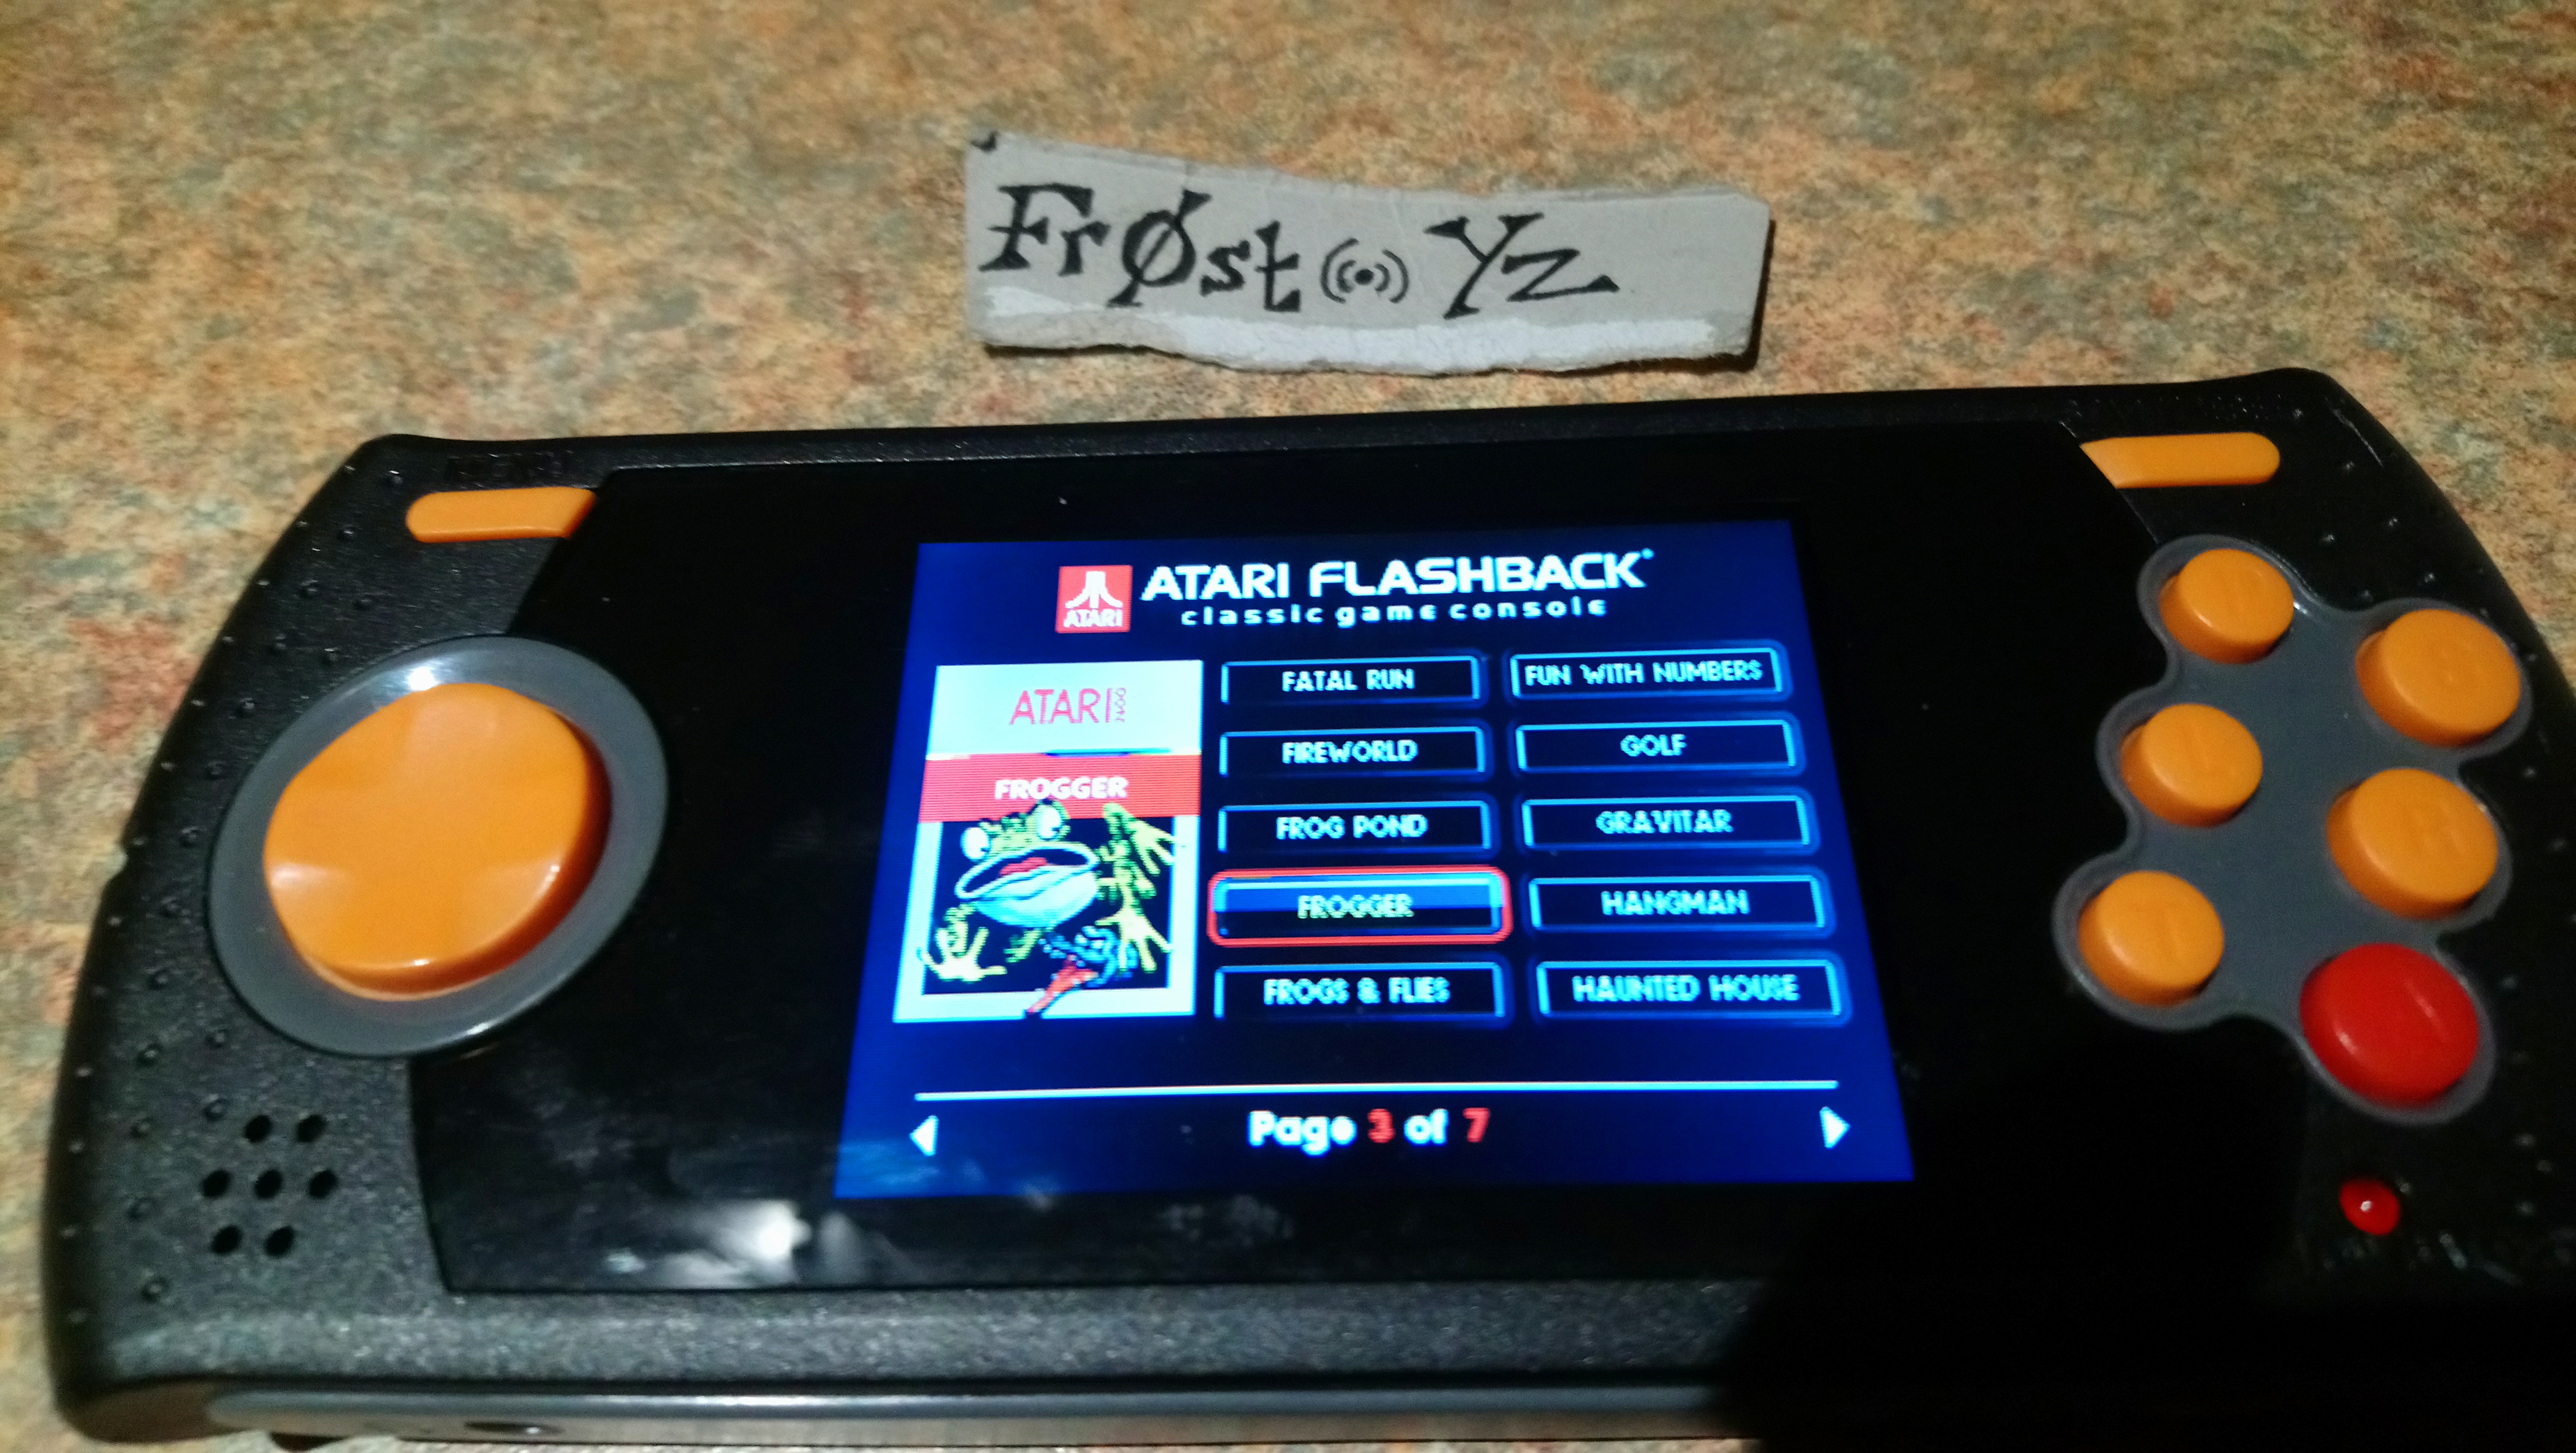 Fr0st: Frogger (Atari 2600 Emulated Novice/B Mode) 2,360 points on 2019-02-25 16:25:27